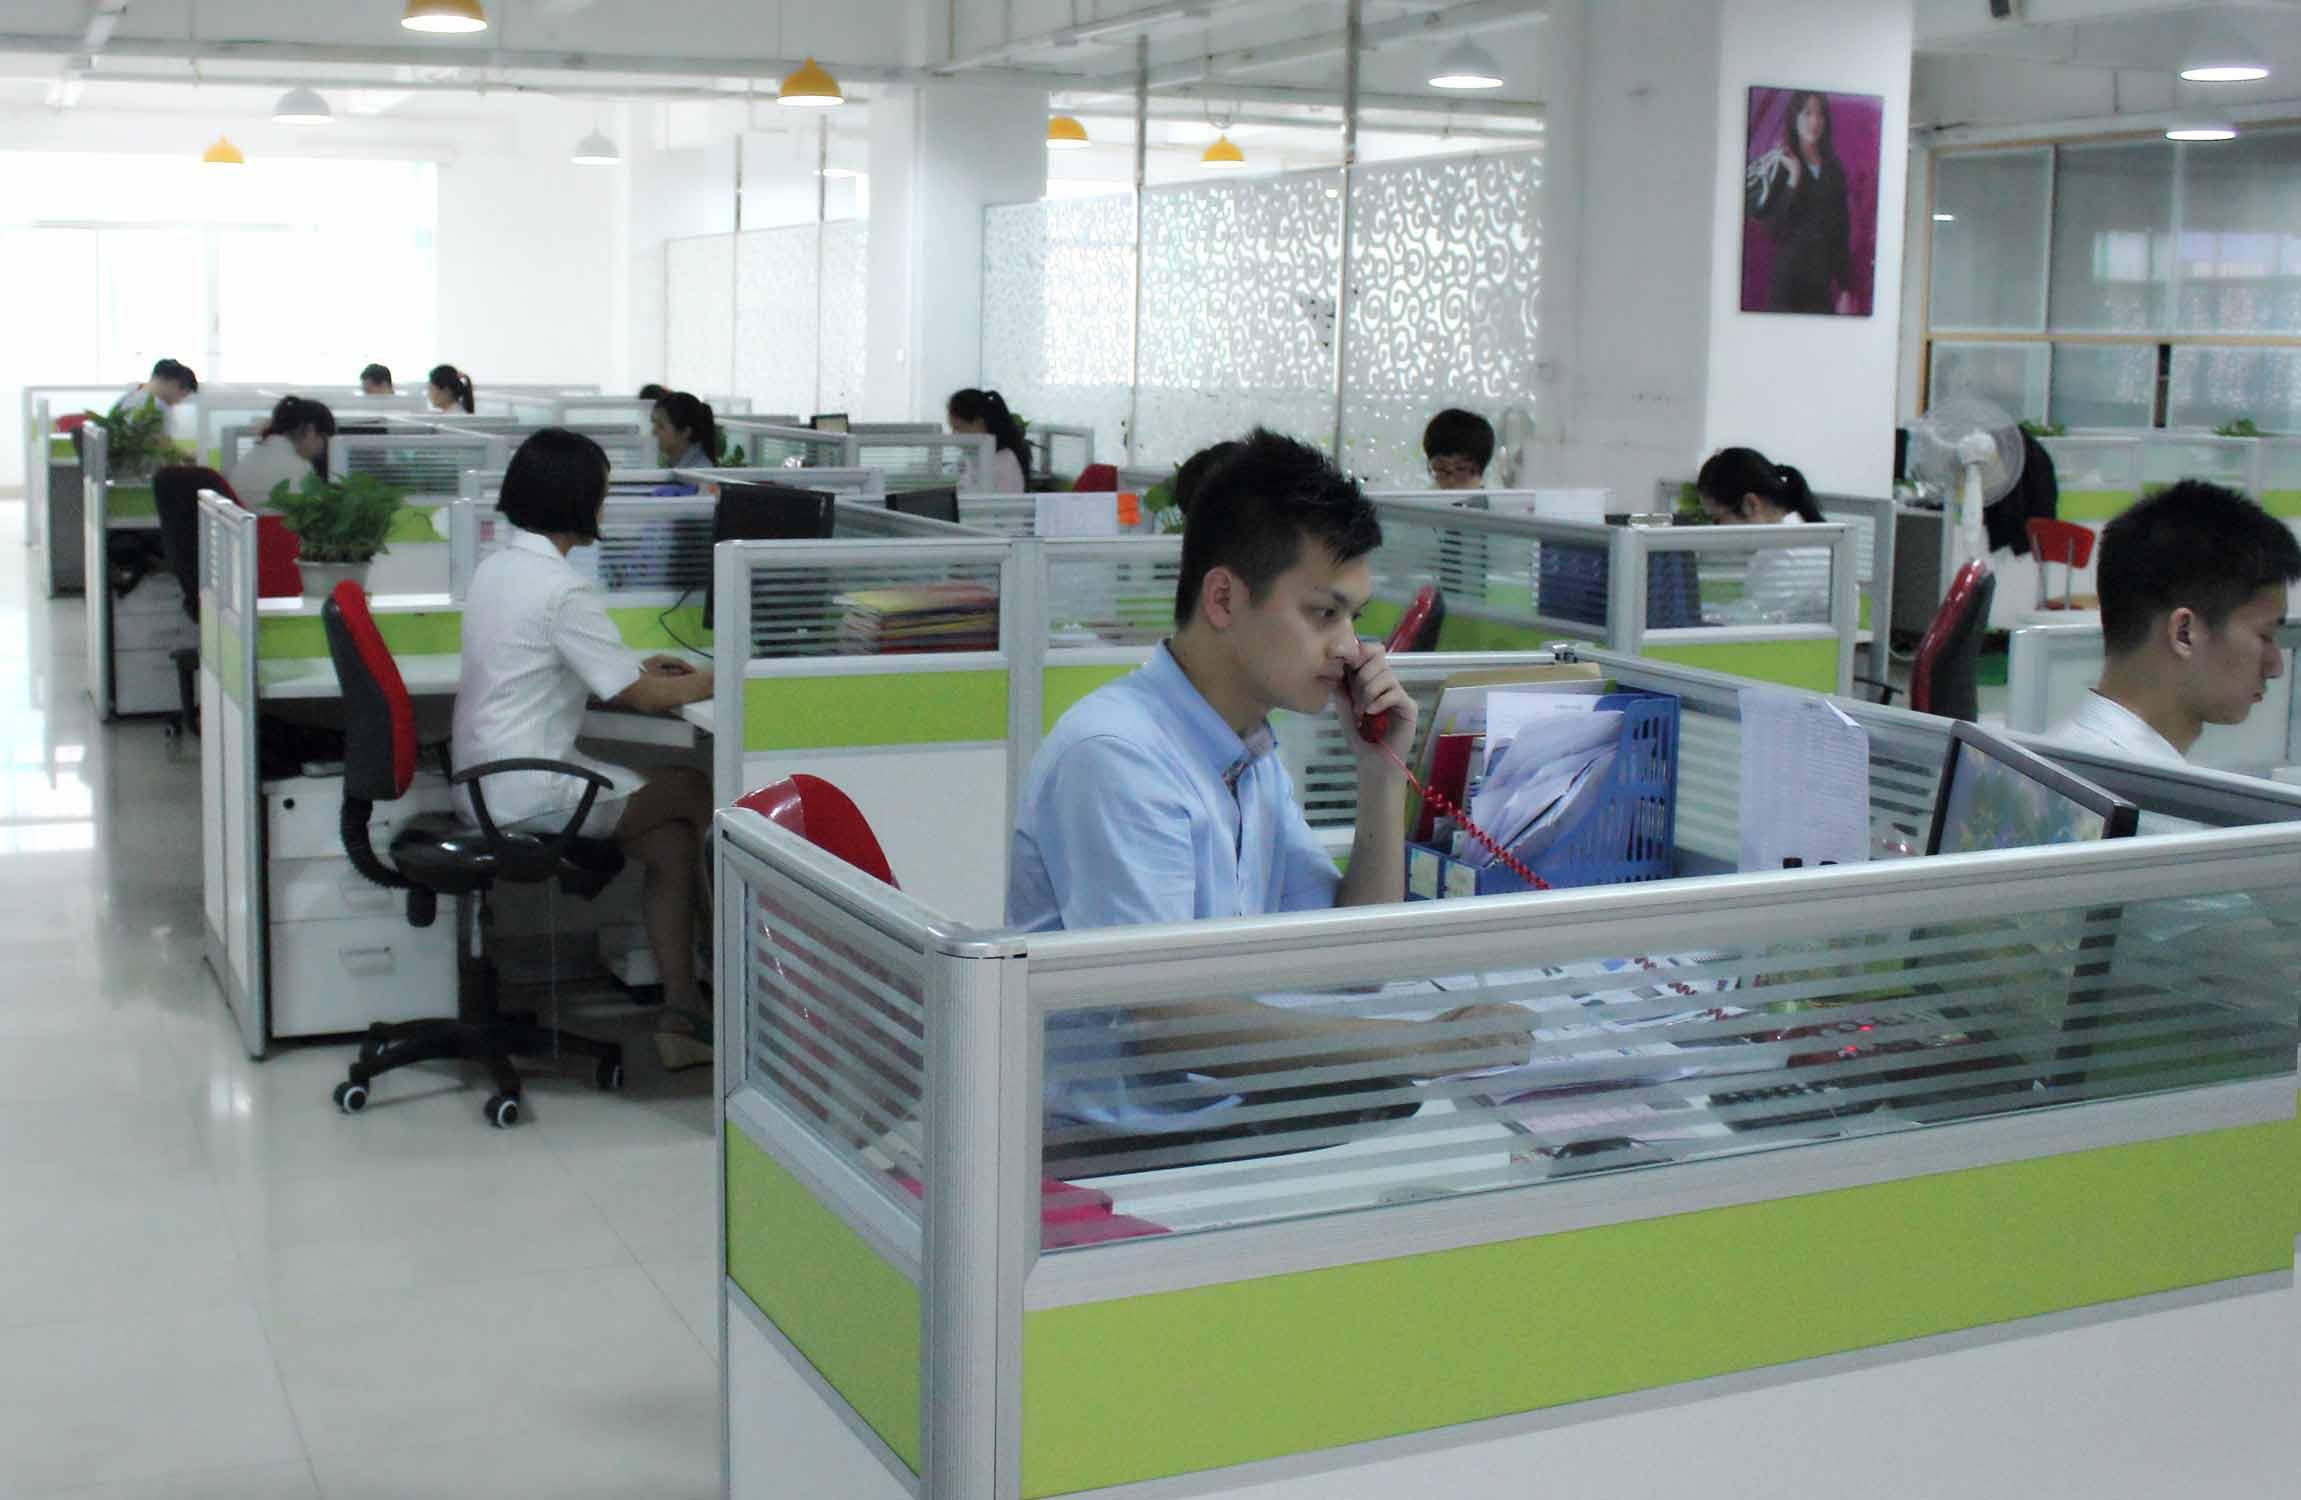 Our colleague